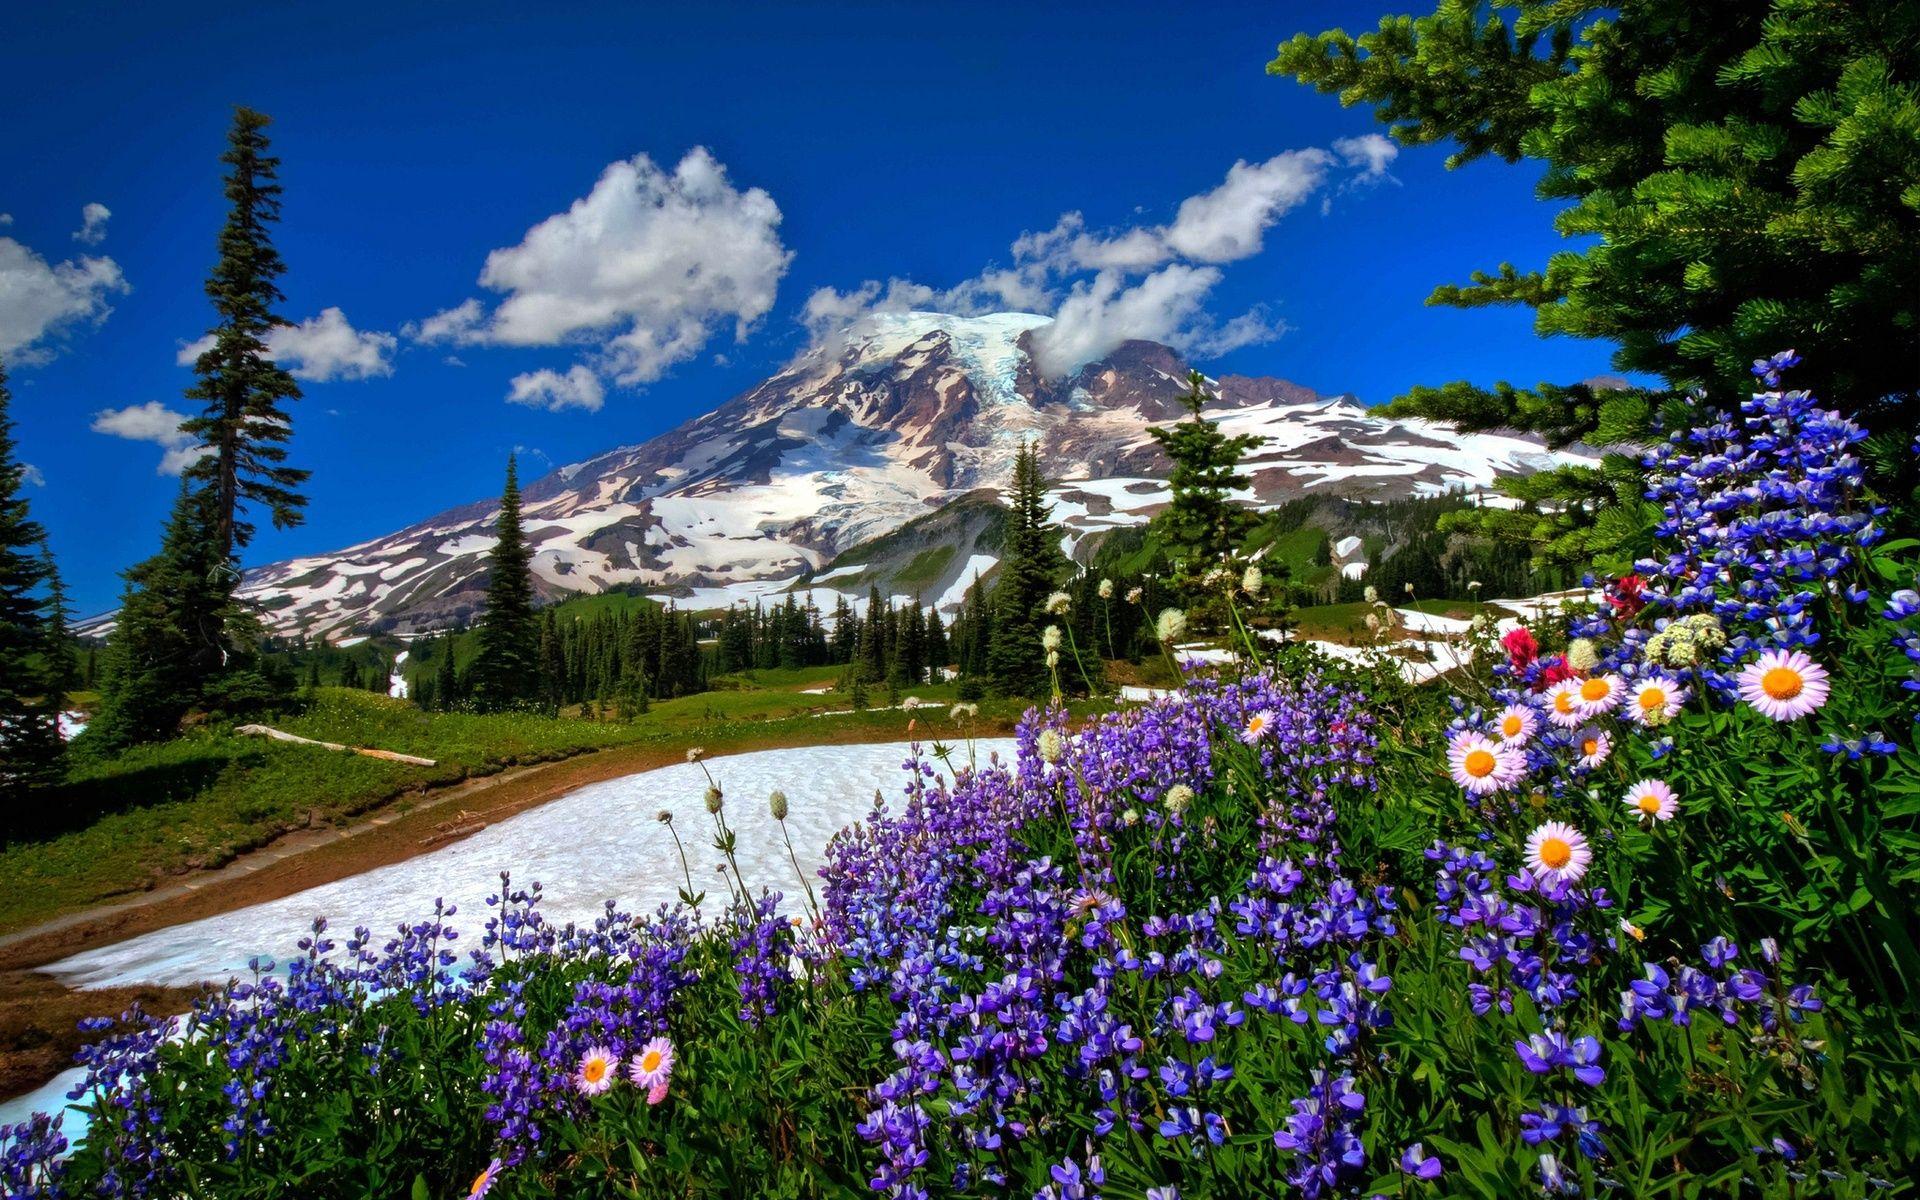 Spring Mountain Landscape Beautiful Landscapes Beautiful Nature Scenery